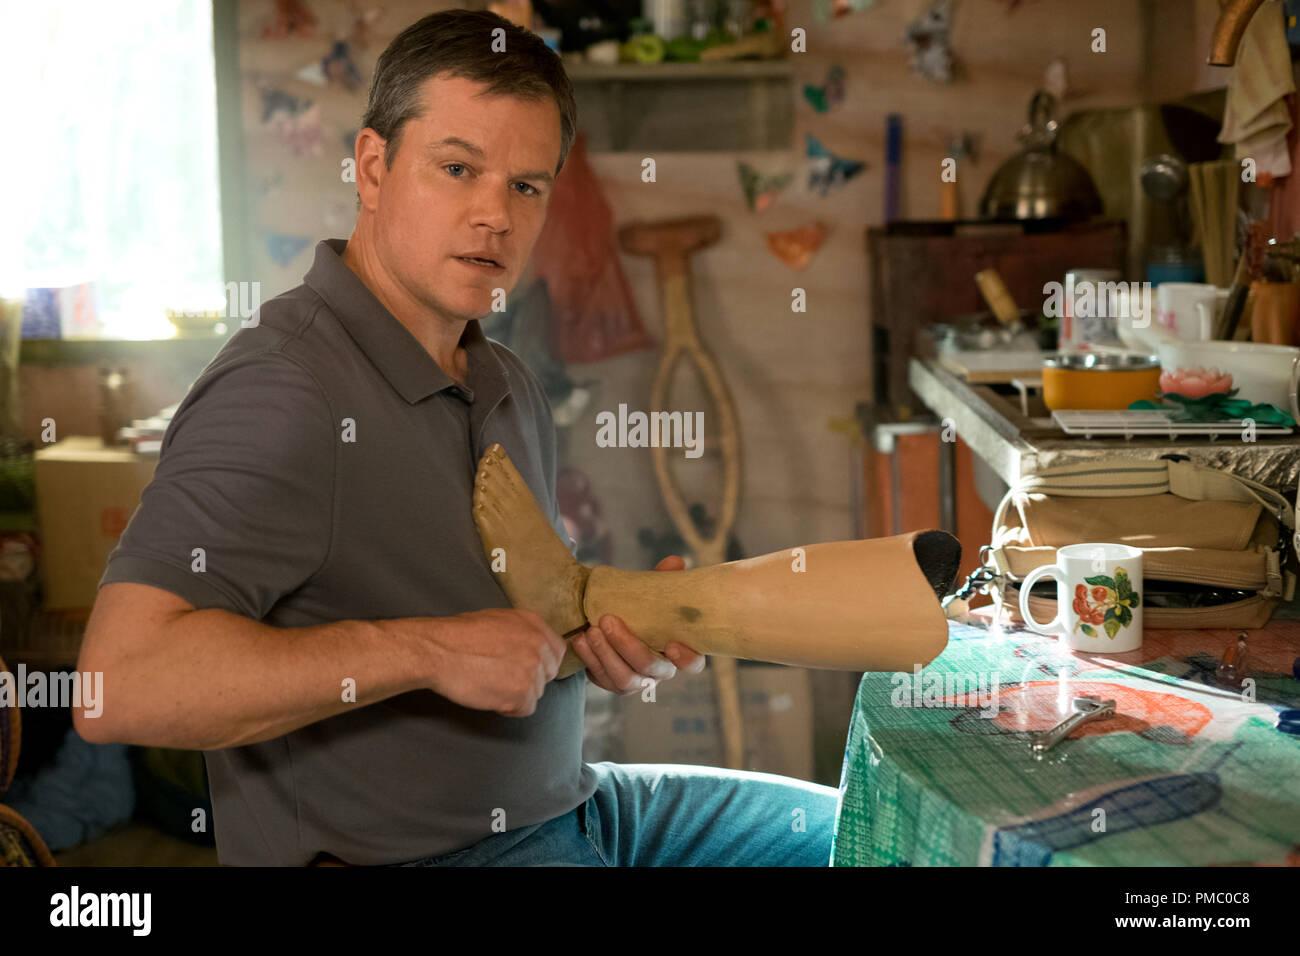 Matt Damon plays Paul Safranek in Downsizing from Paramount Pictures. (2017) - Stock Image